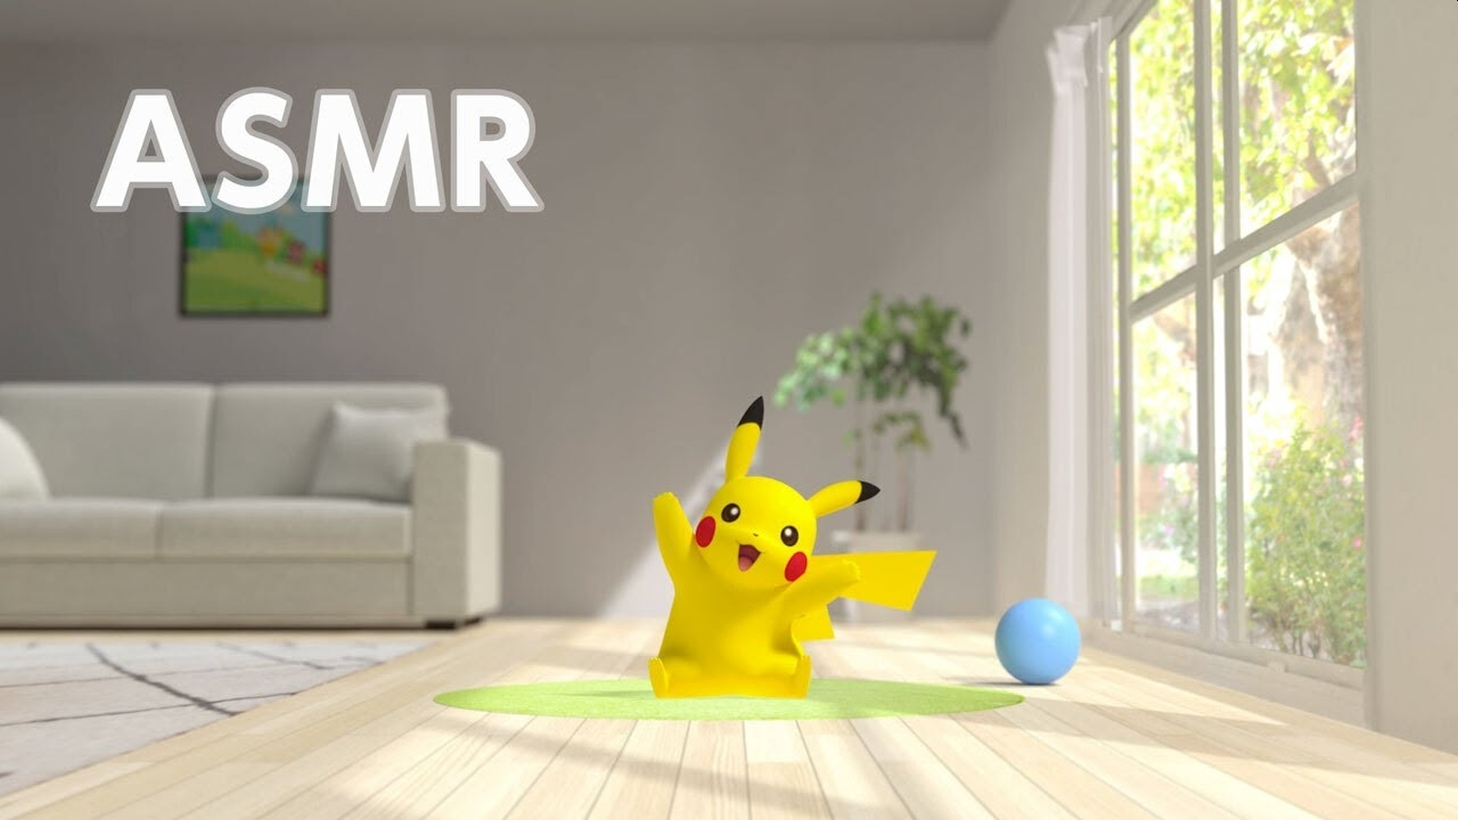 Nintendo Releases New Relaxing Pokémon ASMR Video Starting Pikachu